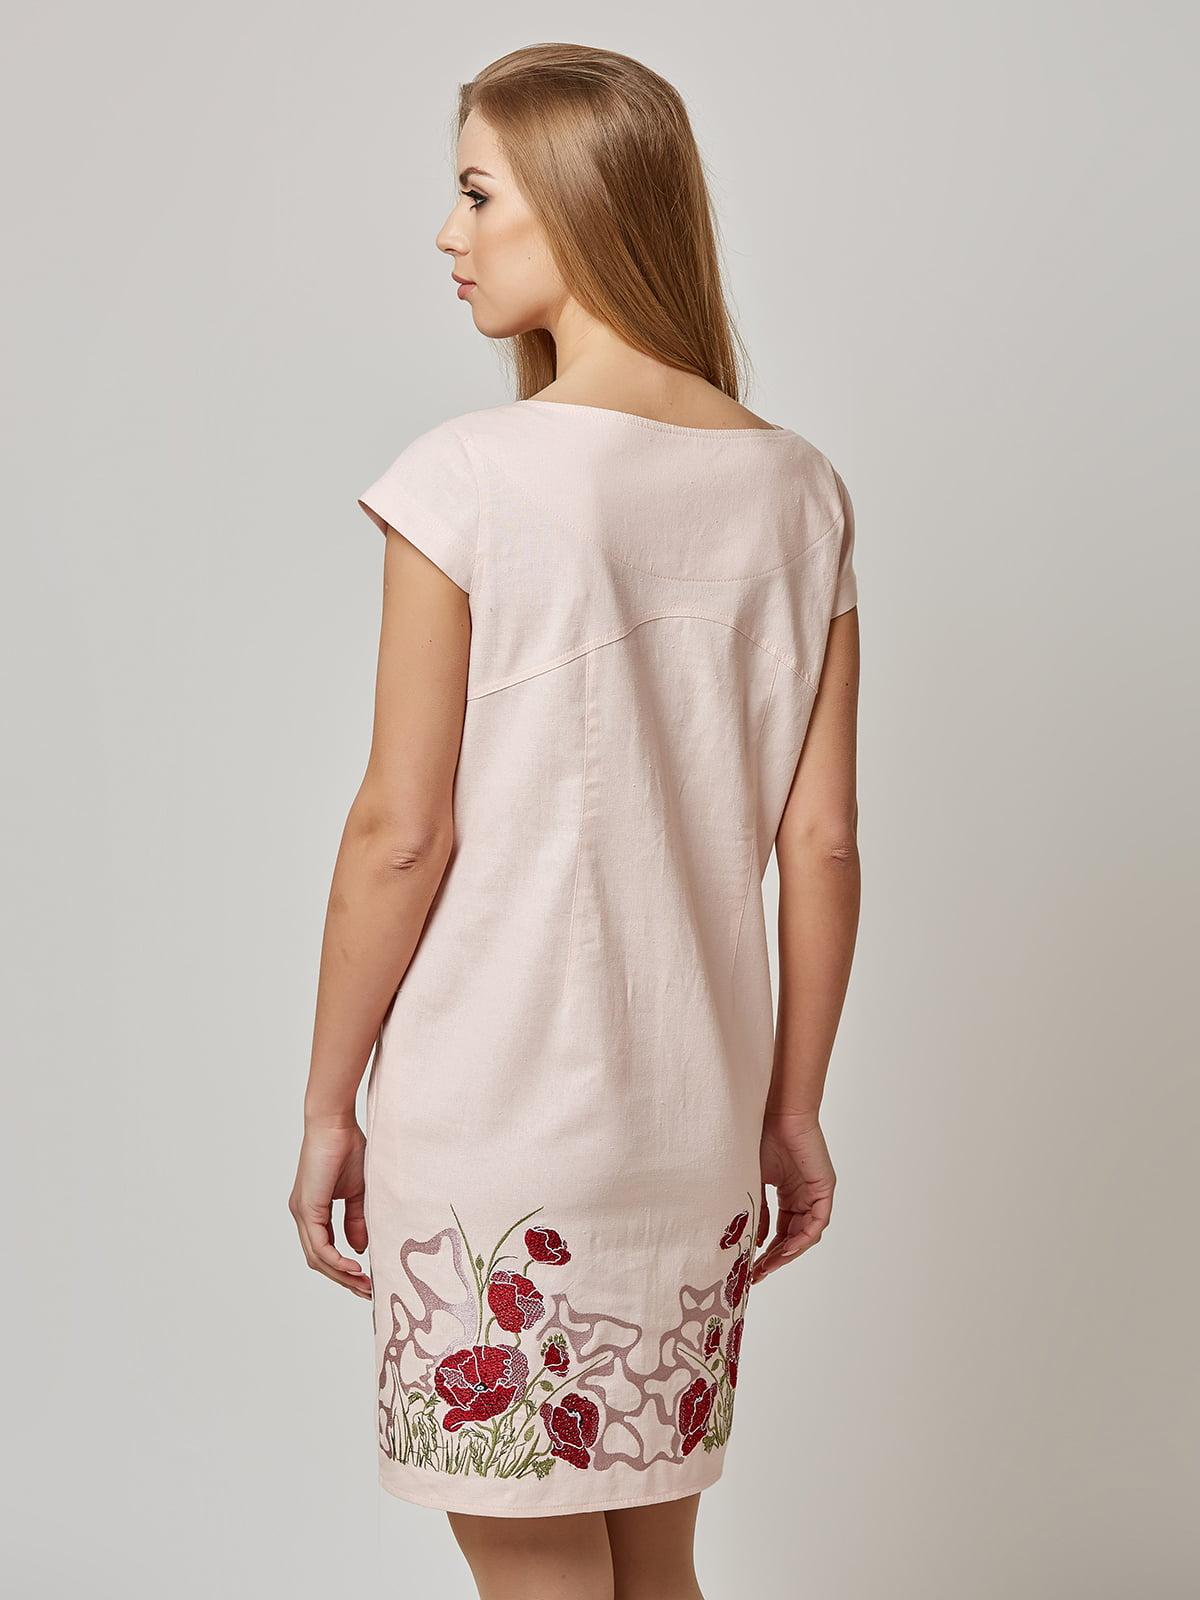 Сукня рожева | 4327656 | фото 2